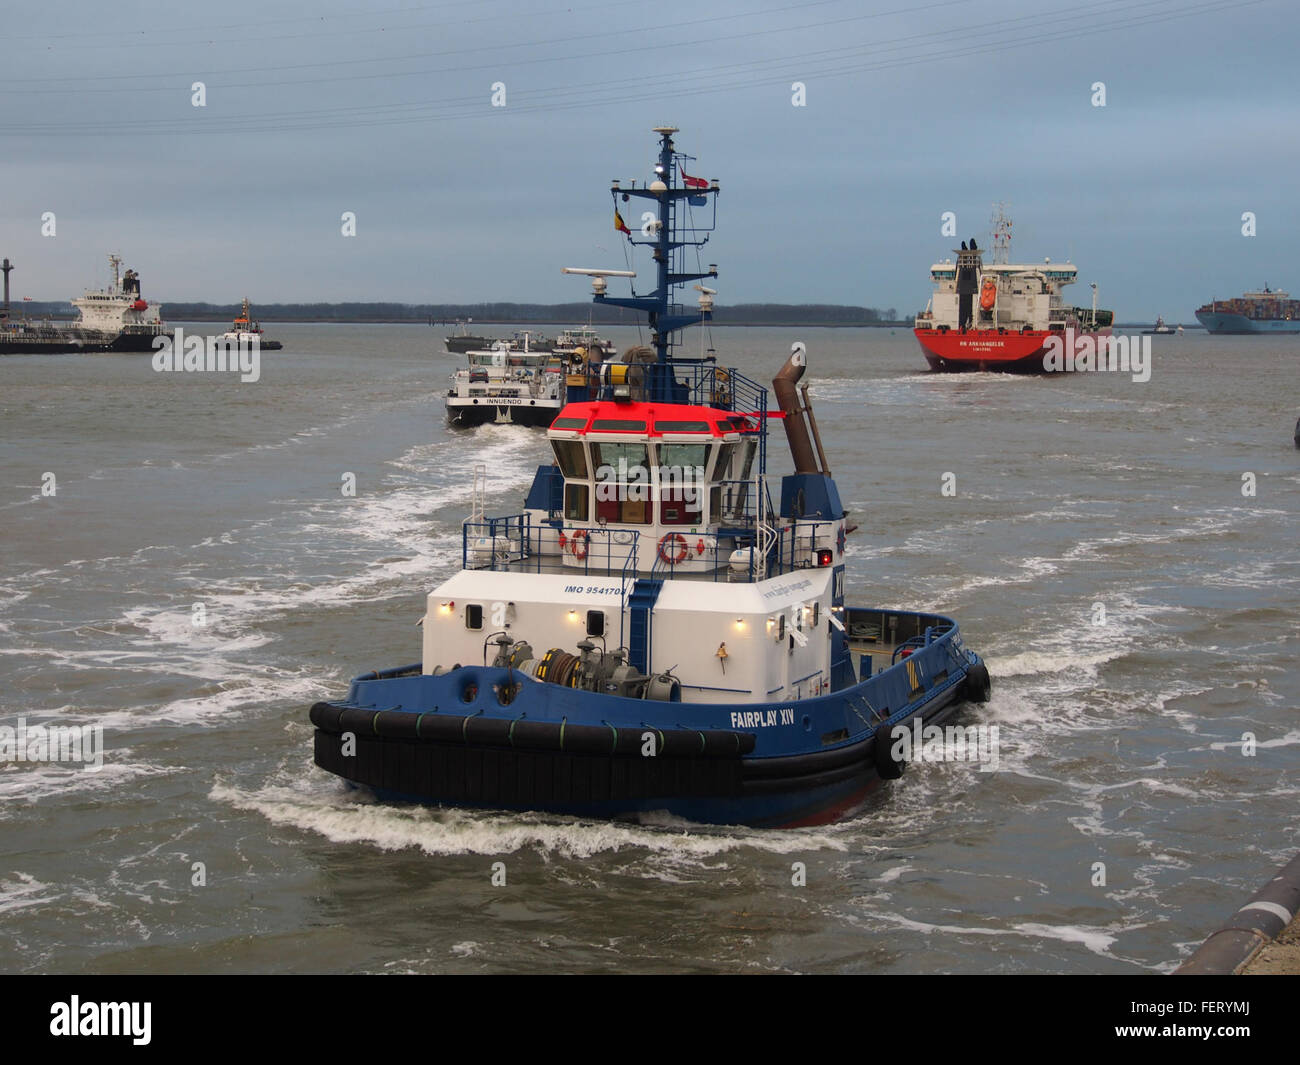 Fairplay (ship, 2009), IMO 9541708, Port of Antwerp pic2 - Stock Image